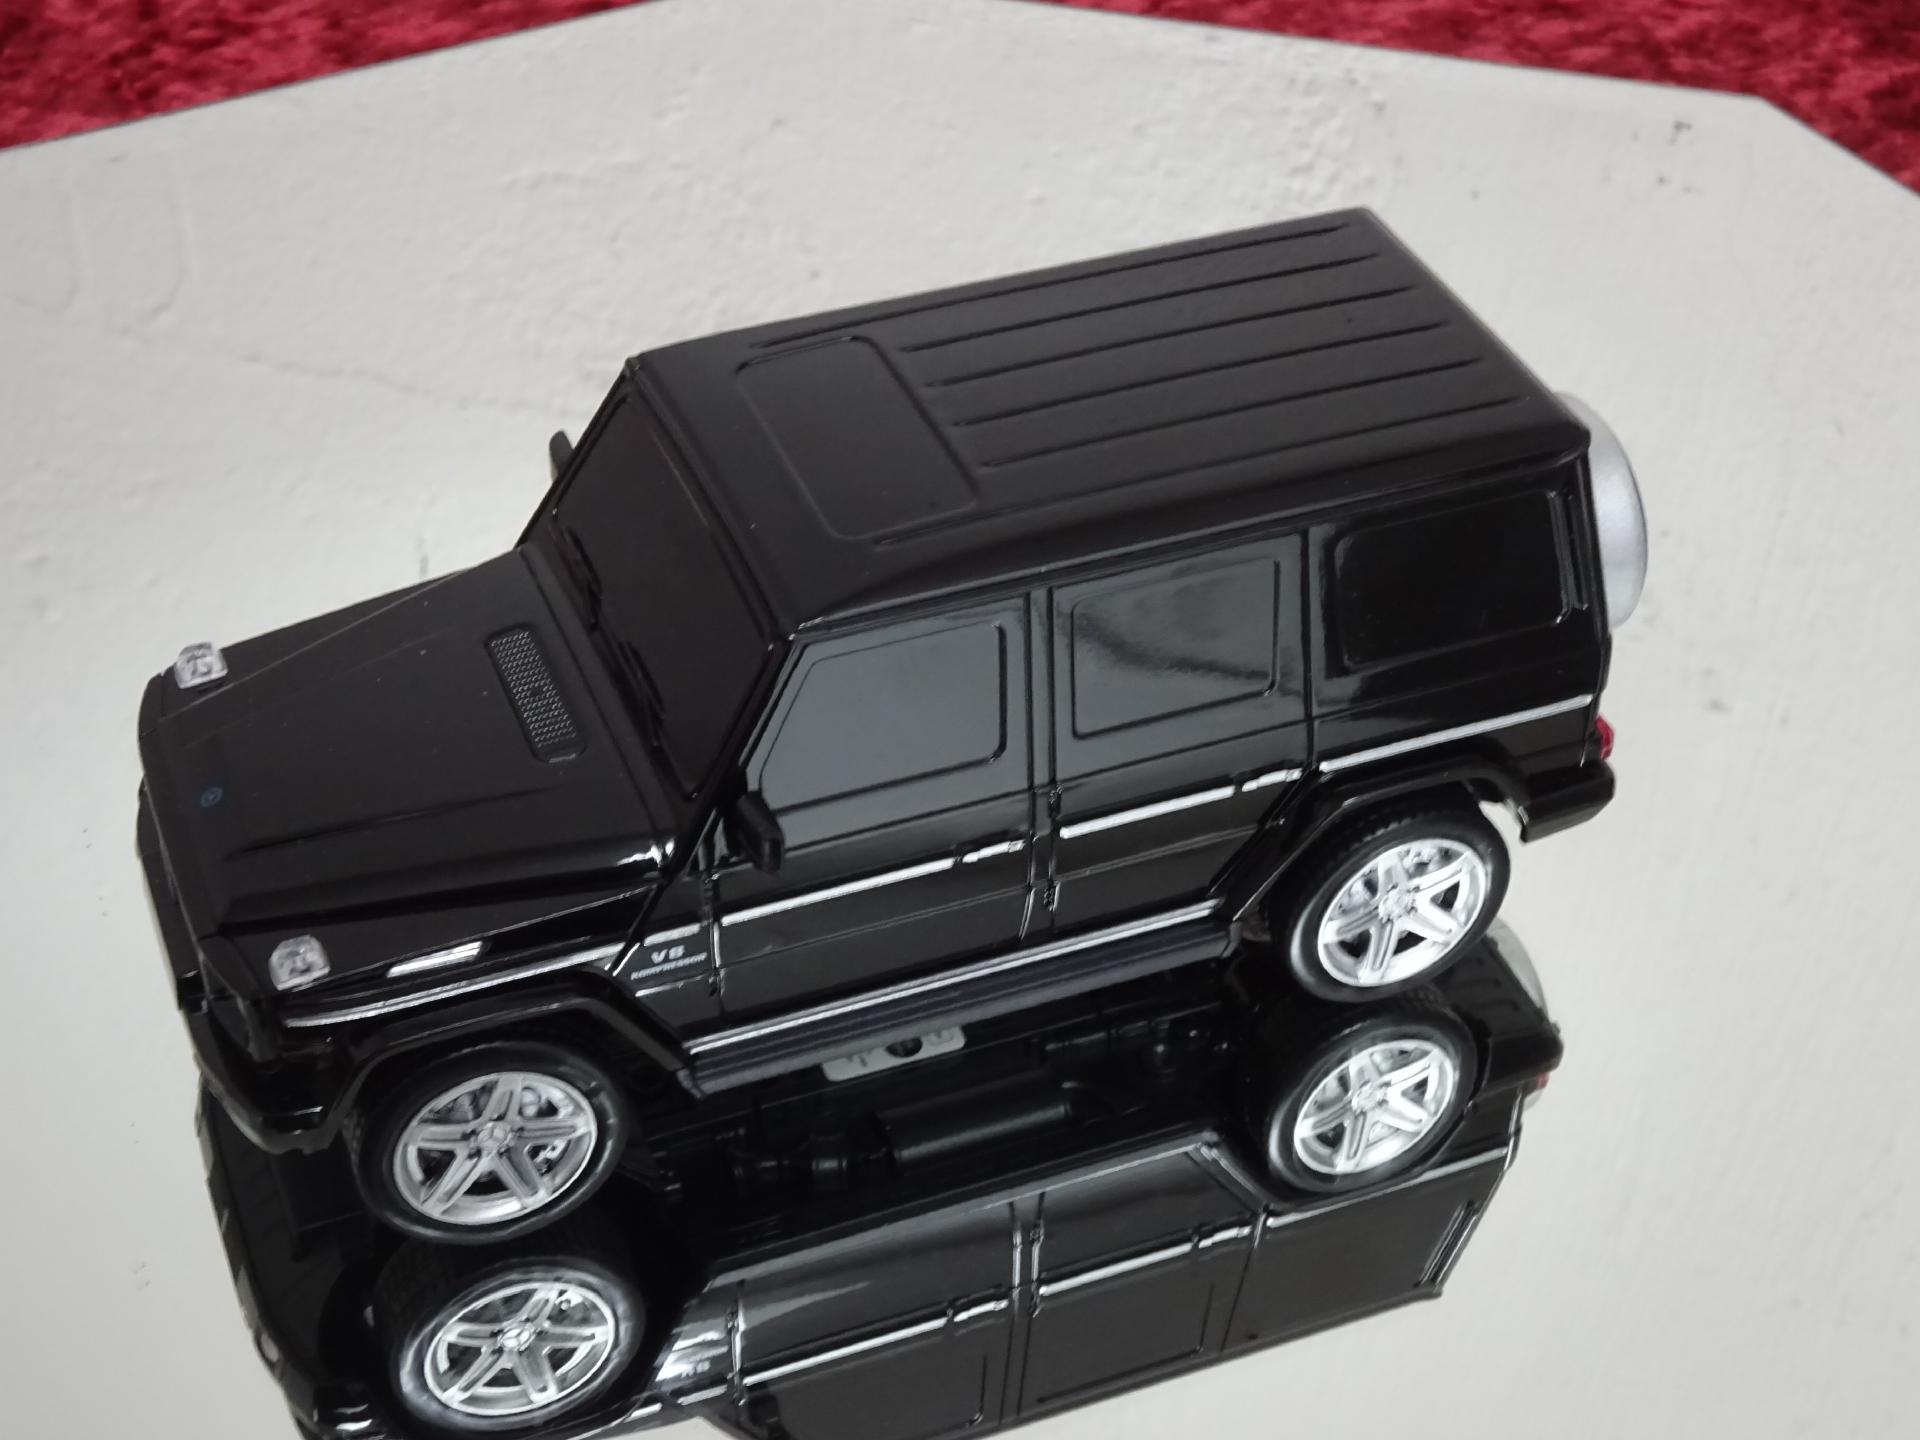 mercedes g modellauto ferngesteuert g55amg 2 willkommen. Black Bedroom Furniture Sets. Home Design Ideas